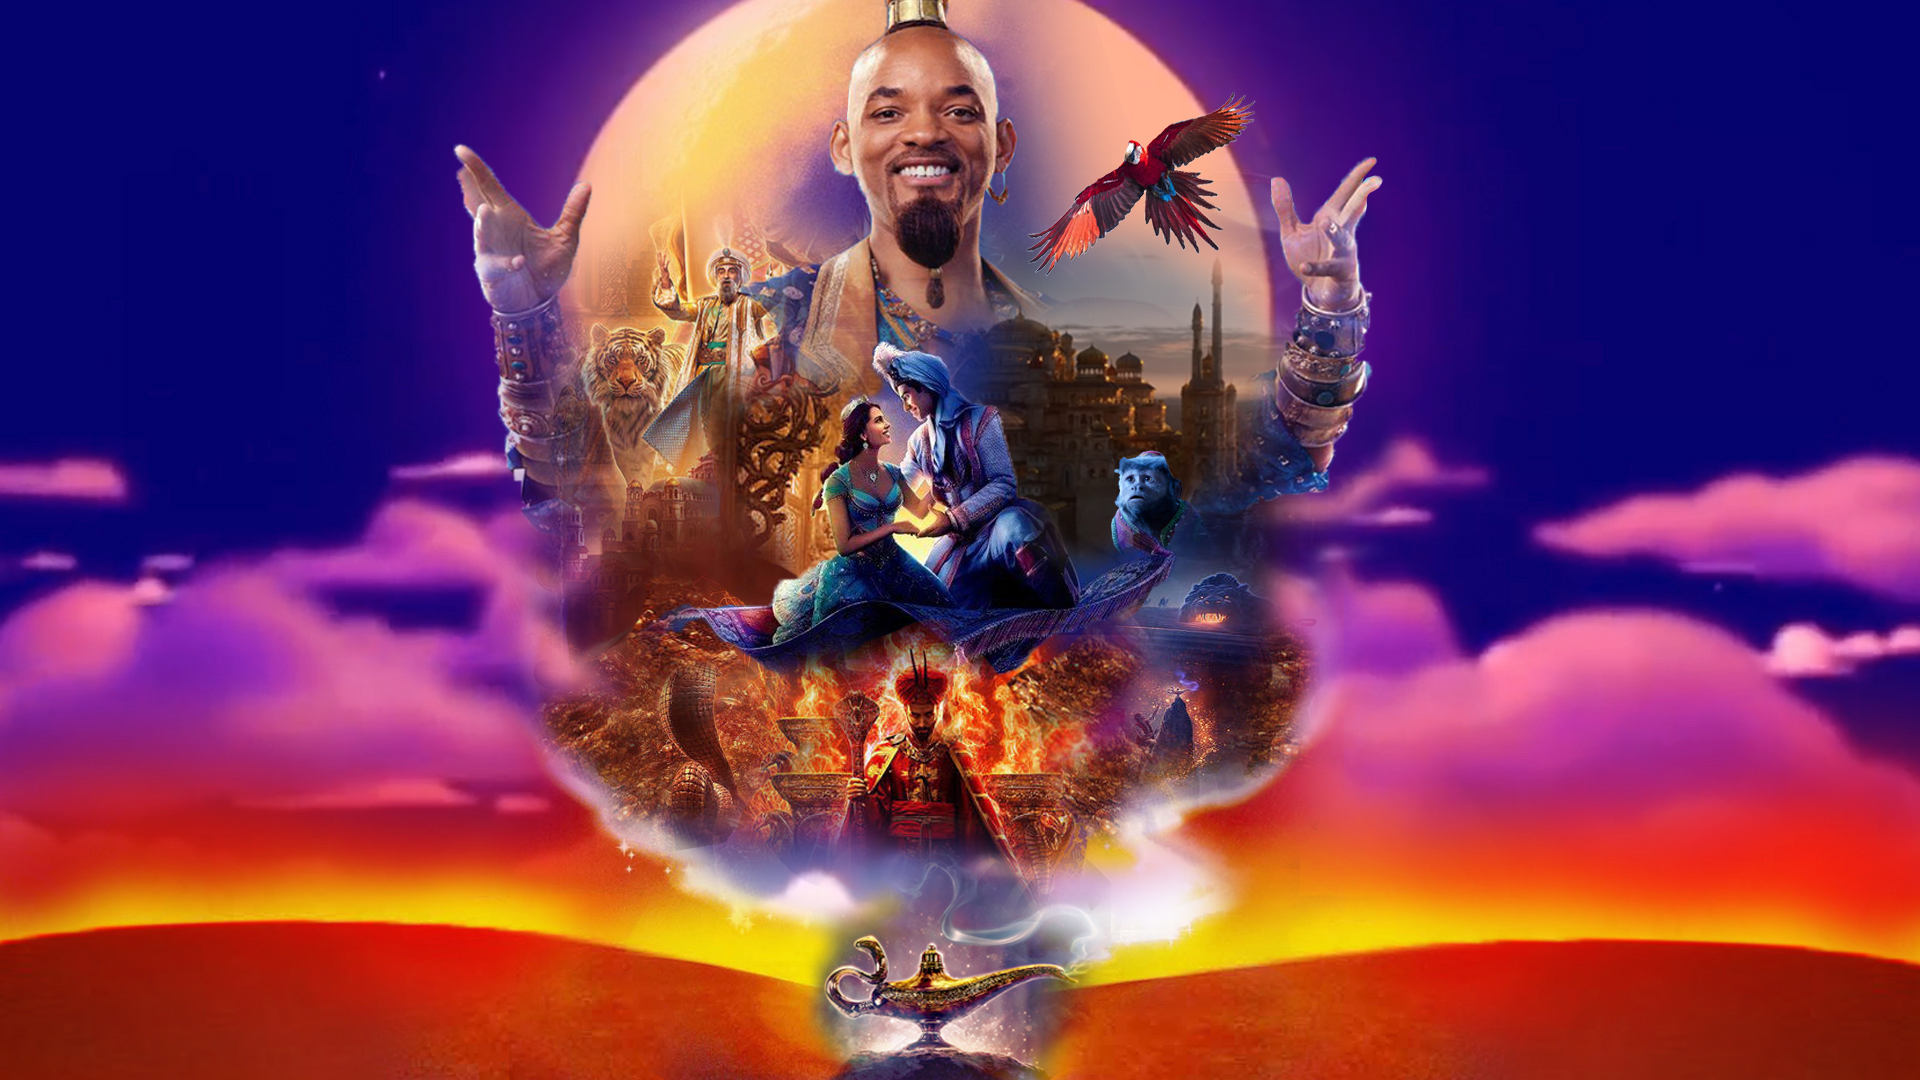 Aladdin (2019) Wallpaper by The-Dark-Mamba-995 on DeviantArt